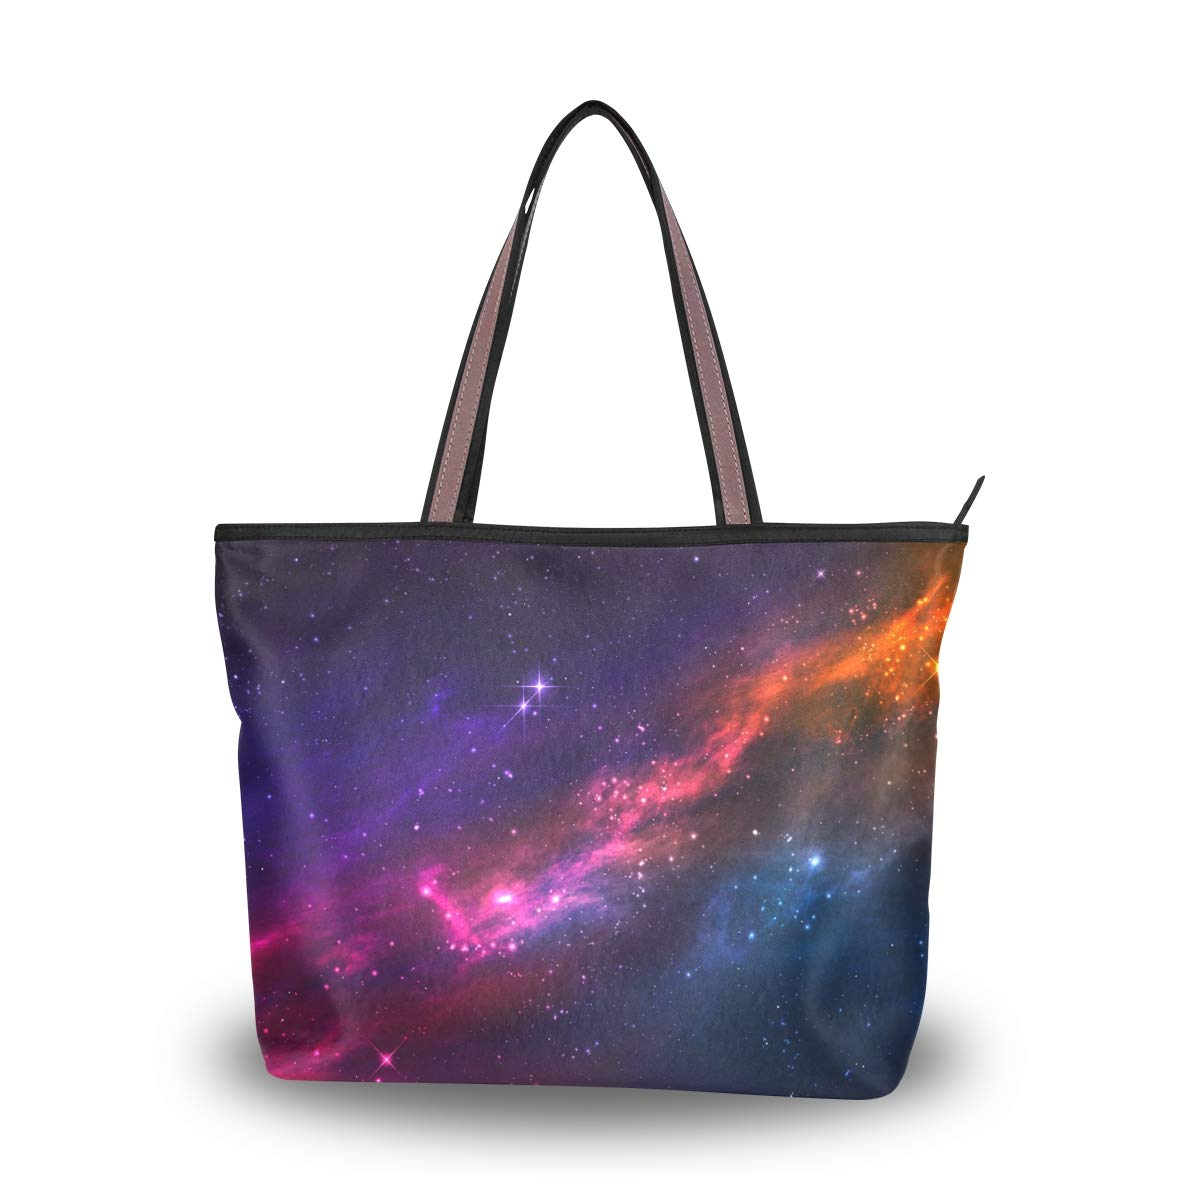 My Daily Women Tote Shoulder Bag Cosmic Nebula Galaxy Handbag